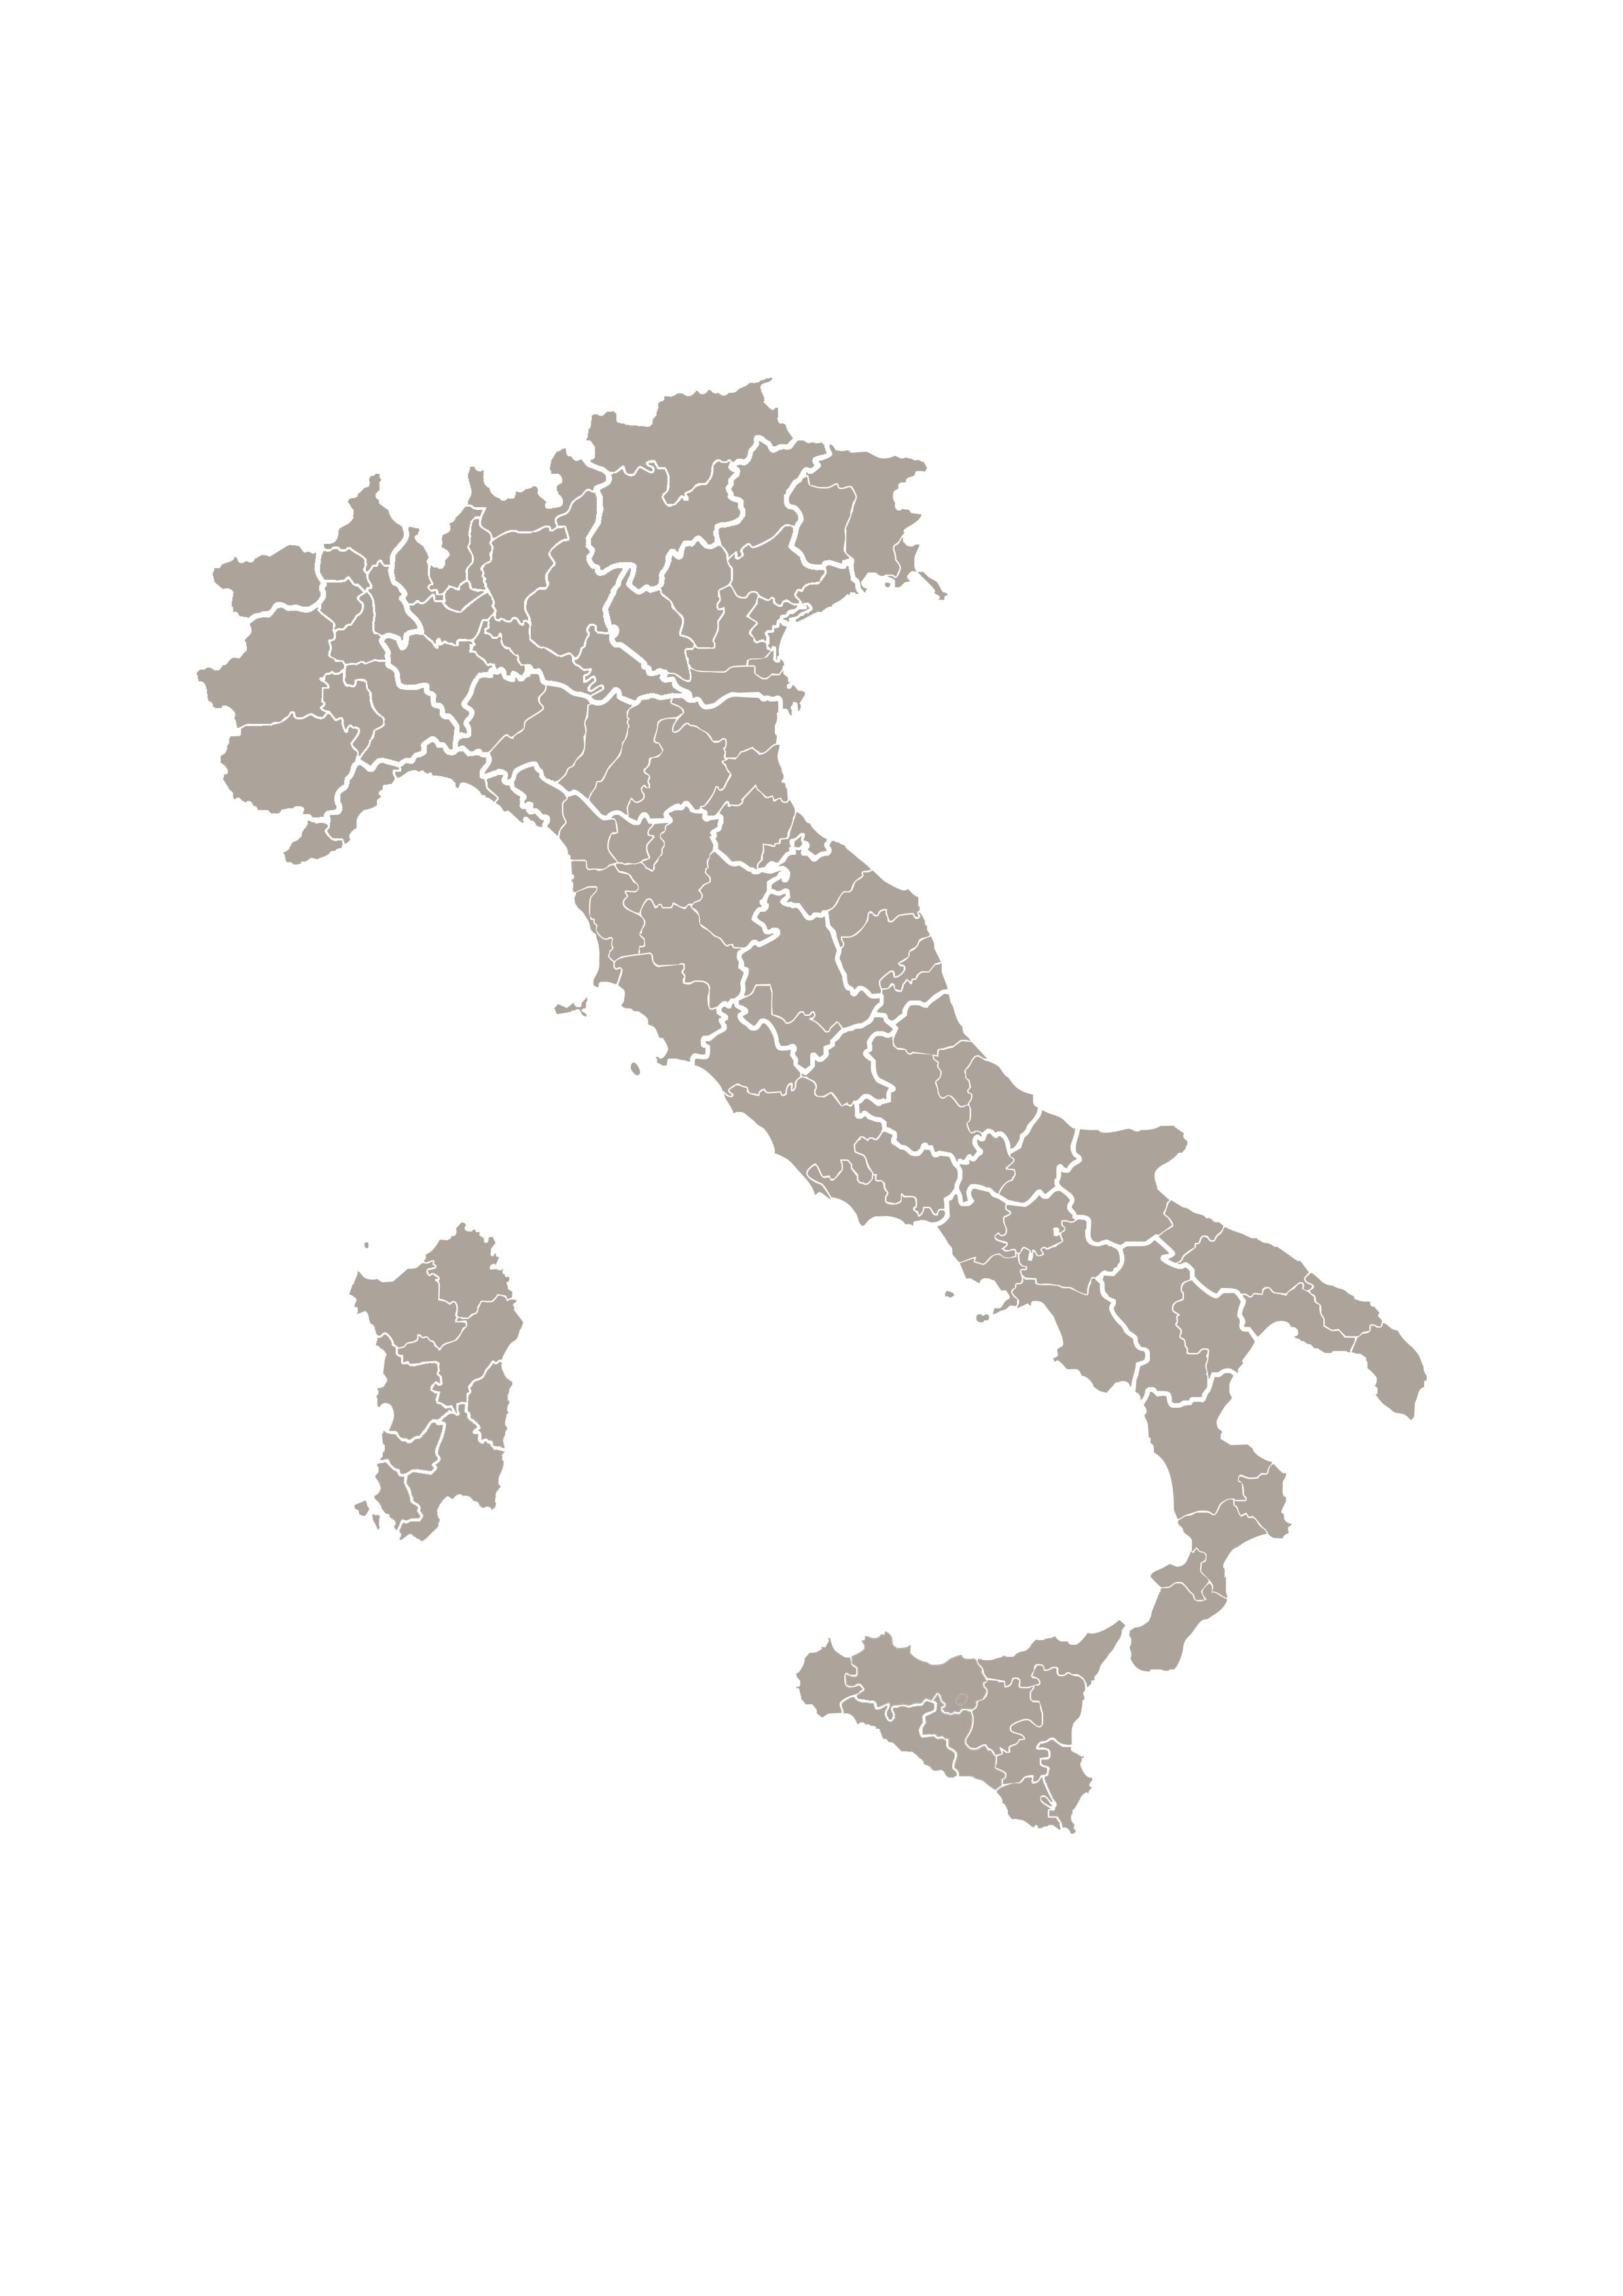 Italia Cartina Province.Cartina Italia Vettoriale Suddivisione Province By Xtremeflier On Deviantart